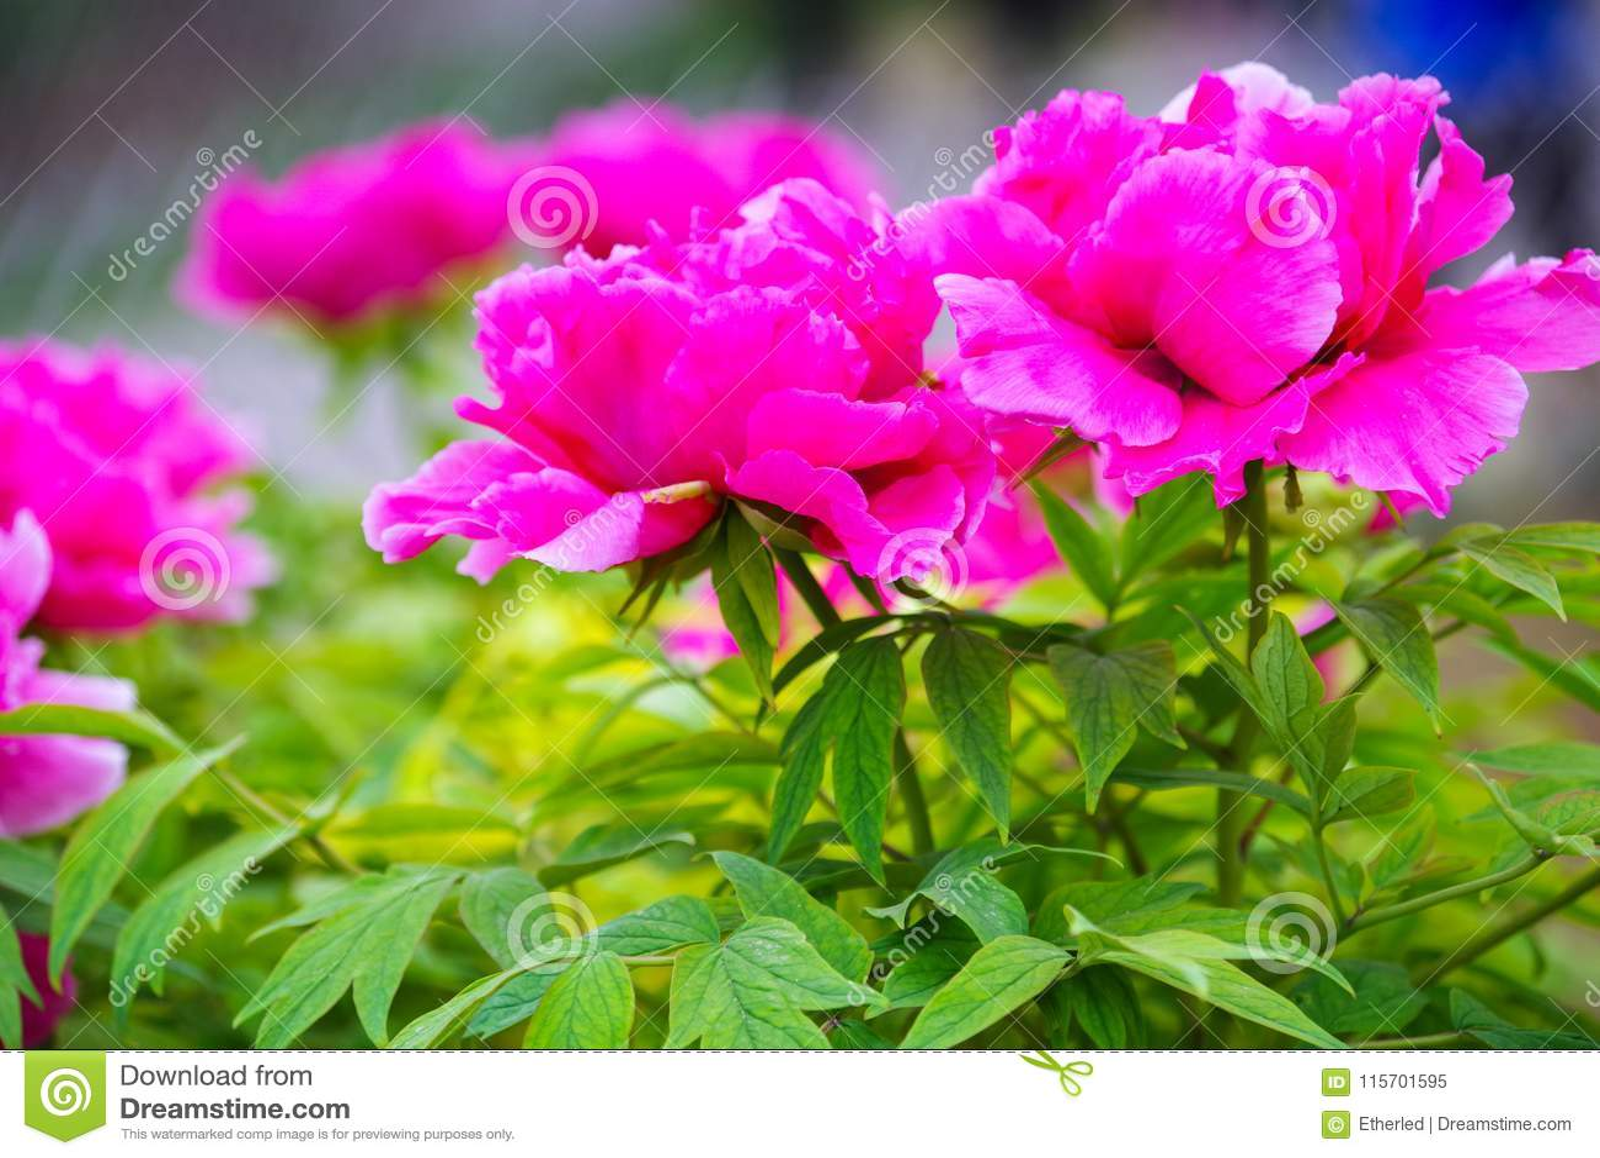 Pink Peony Chinese National Flower Stock Image Image Of China